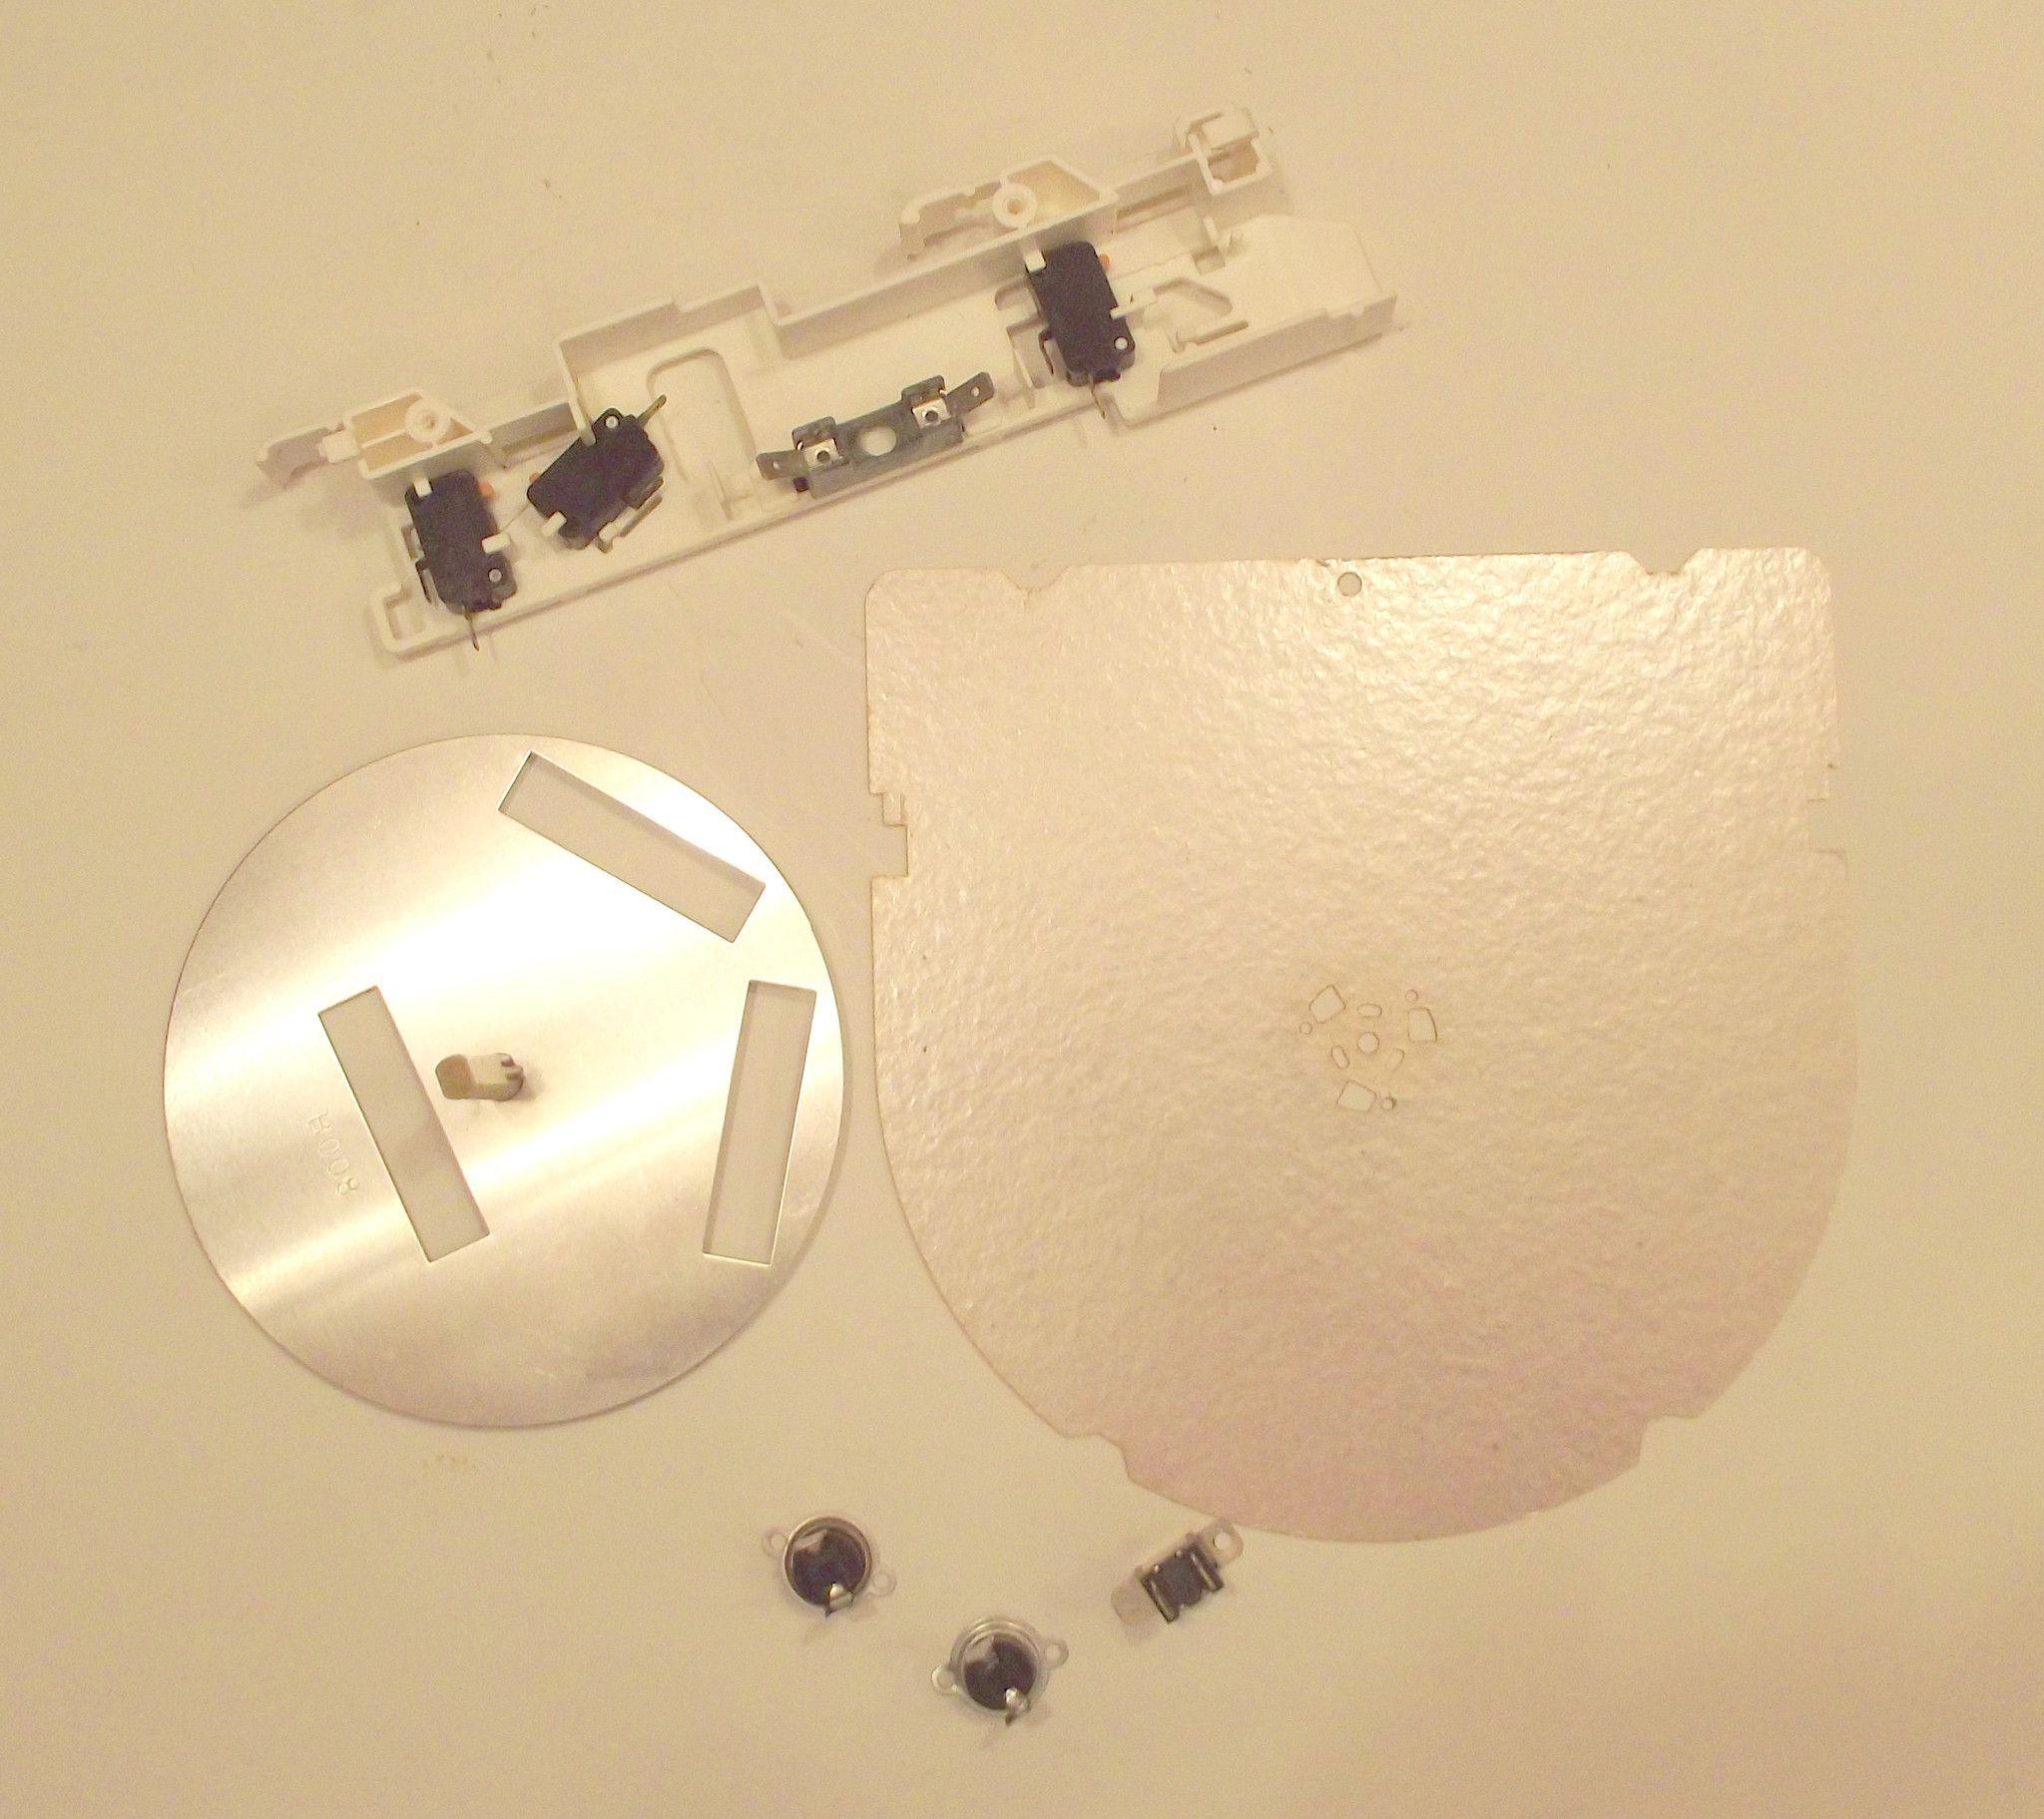 Fcovpb012mryoa 46 1730108 3 Rthm B005mre0 Sharp Microwave Parts Pack